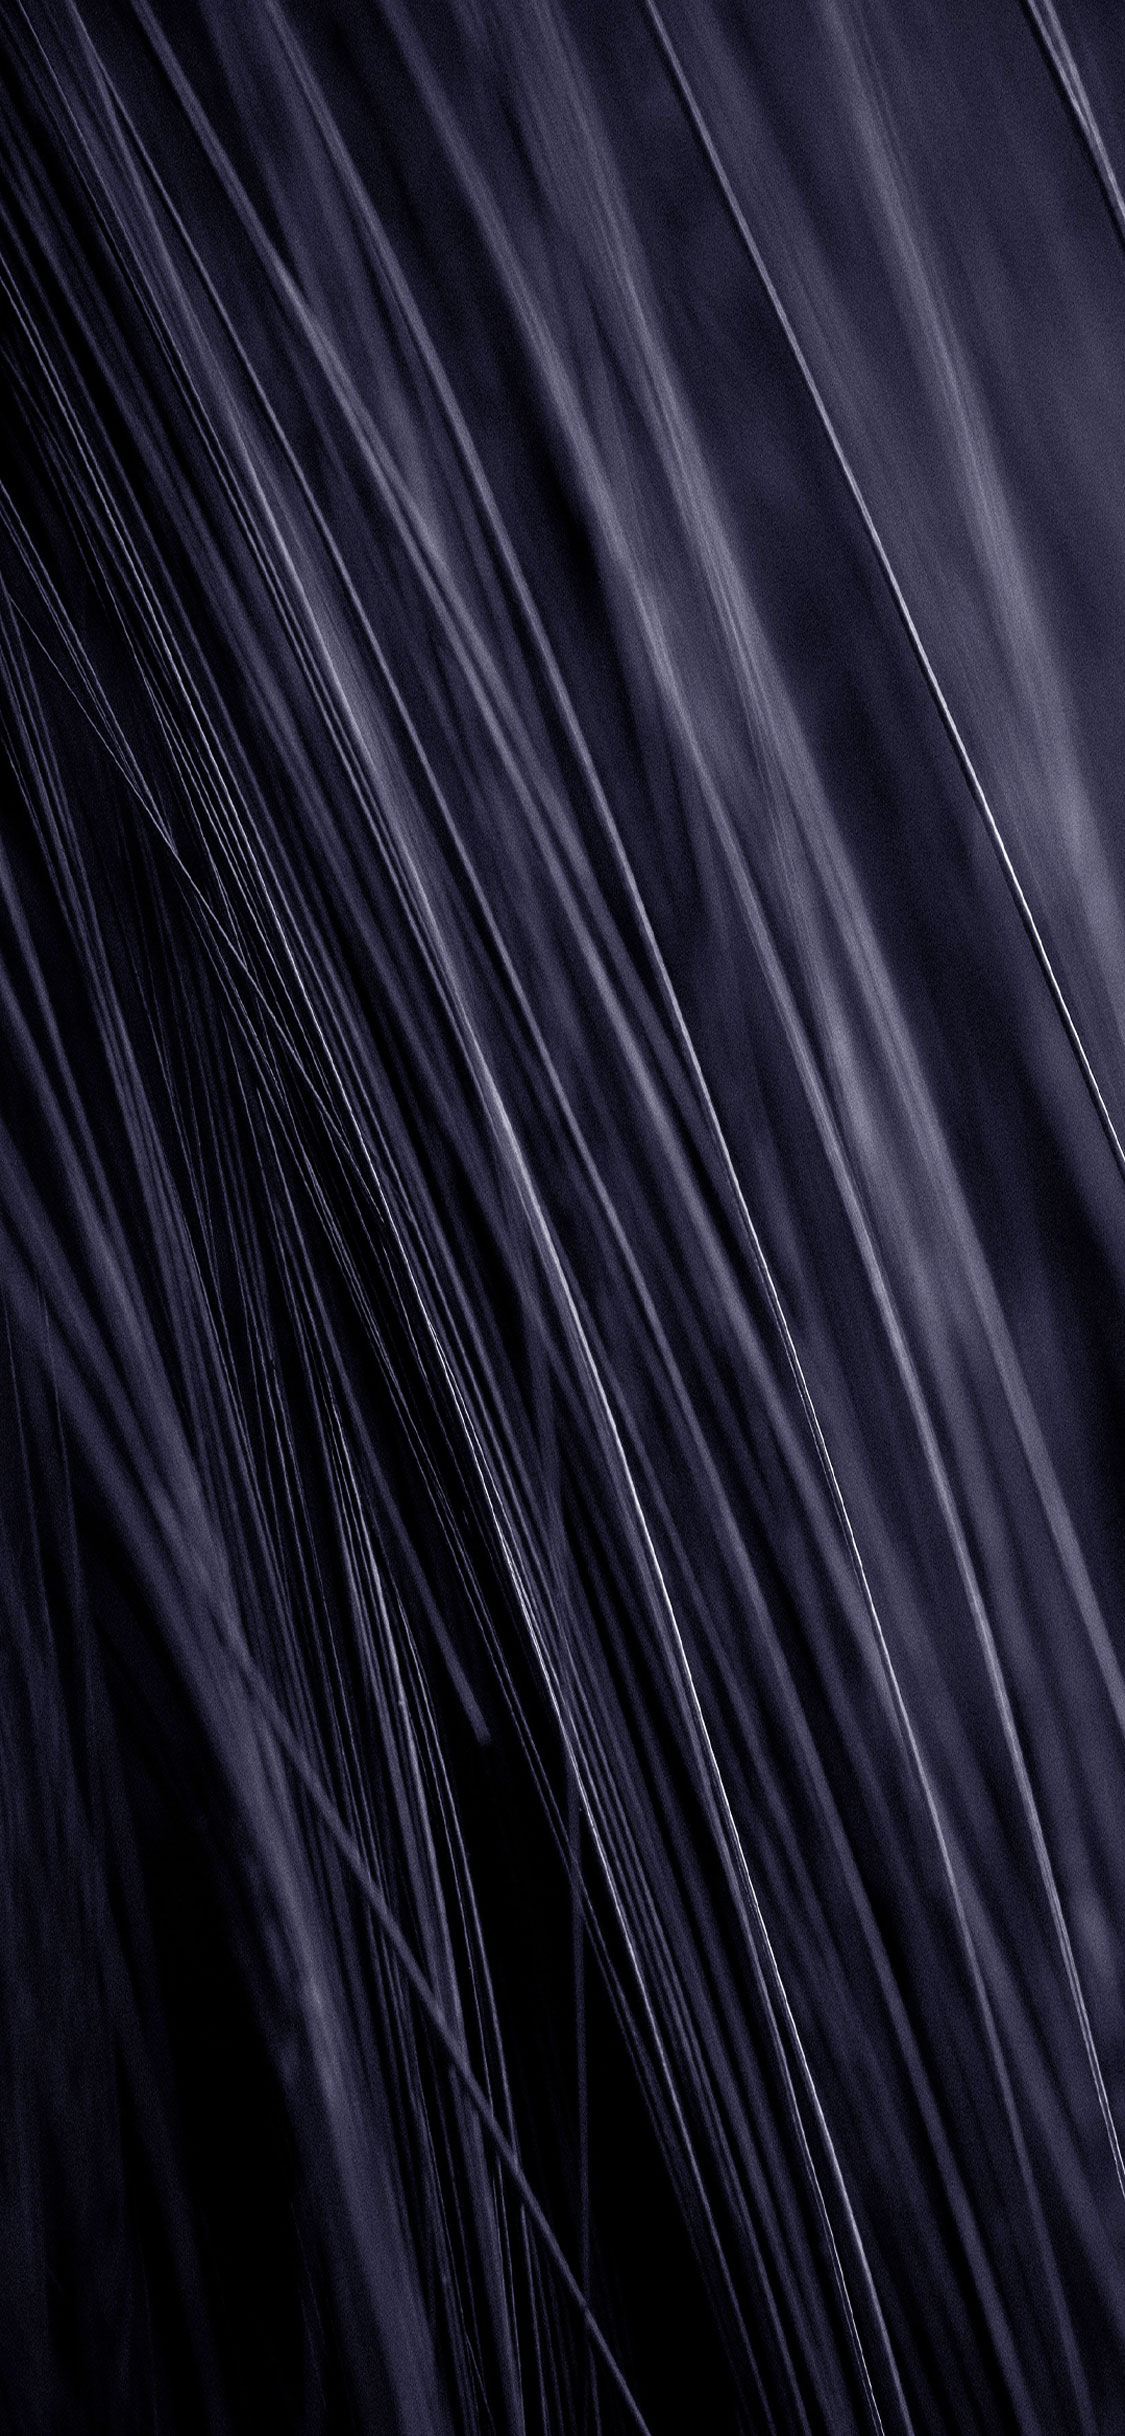 Black Hairs Apple iPhone X Wallpaper 1